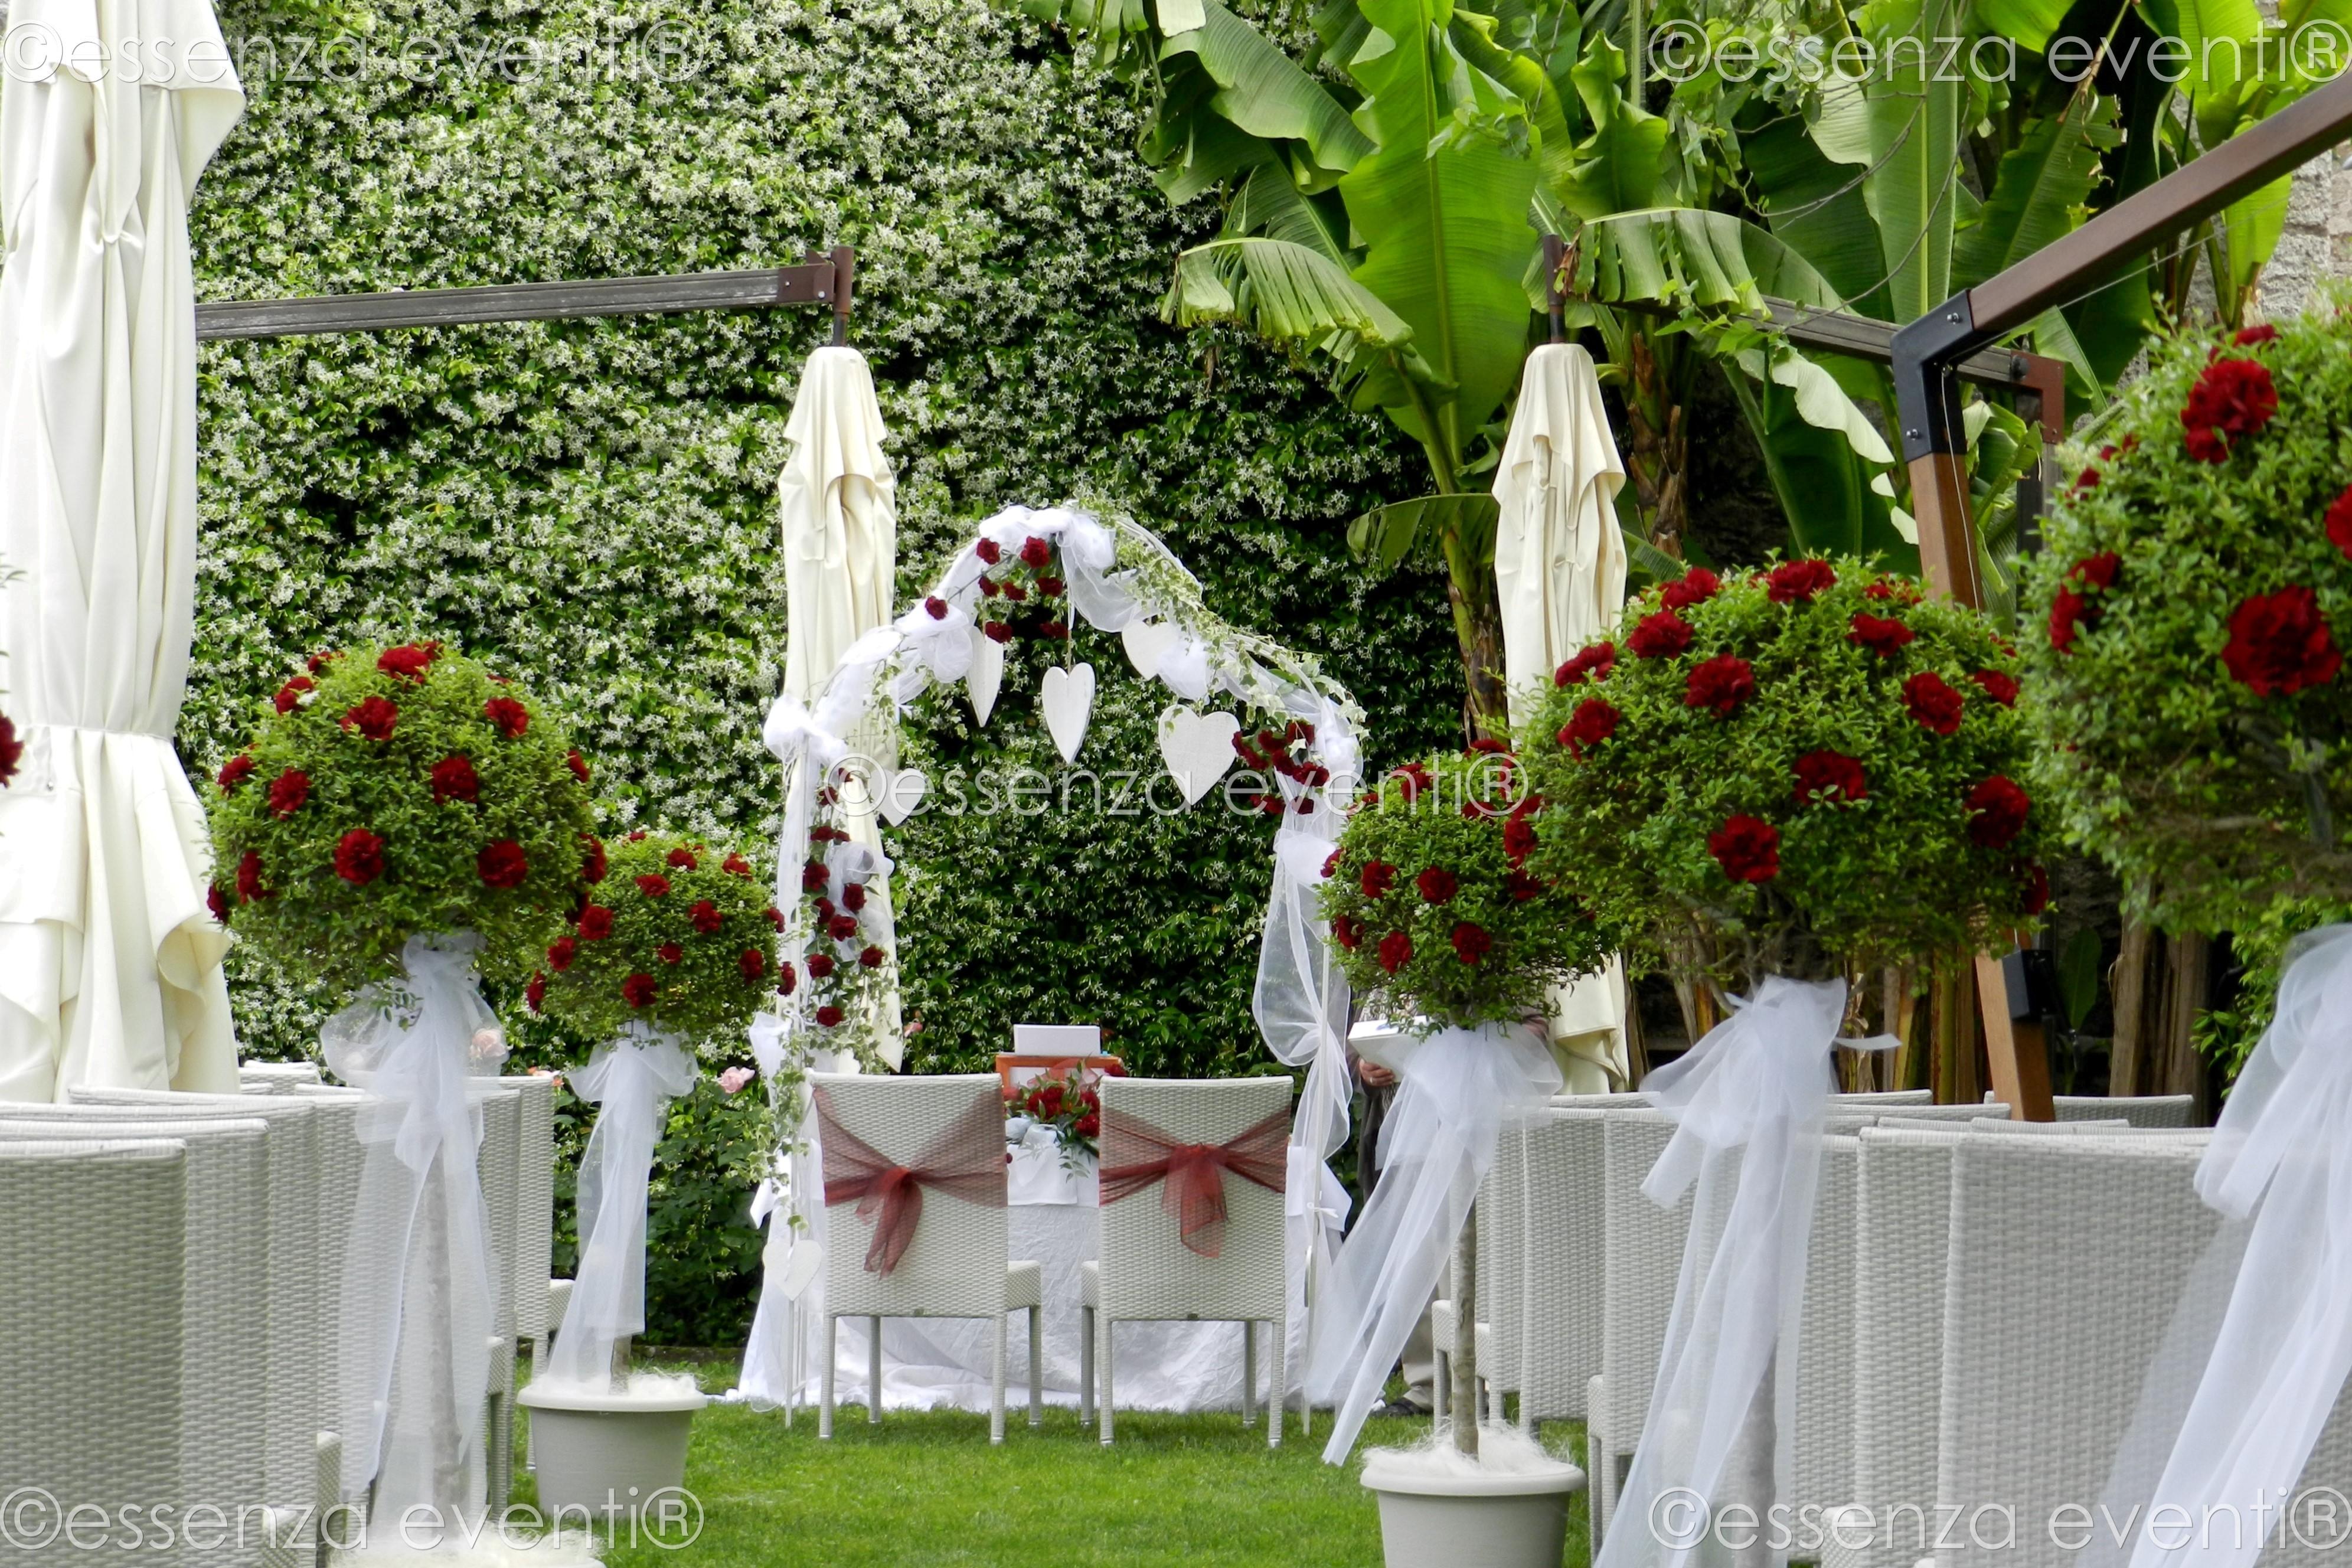 Celebrante Matrimonio Simbolico Torino : Cerimonia antonio e alina essenza eventi celebrante